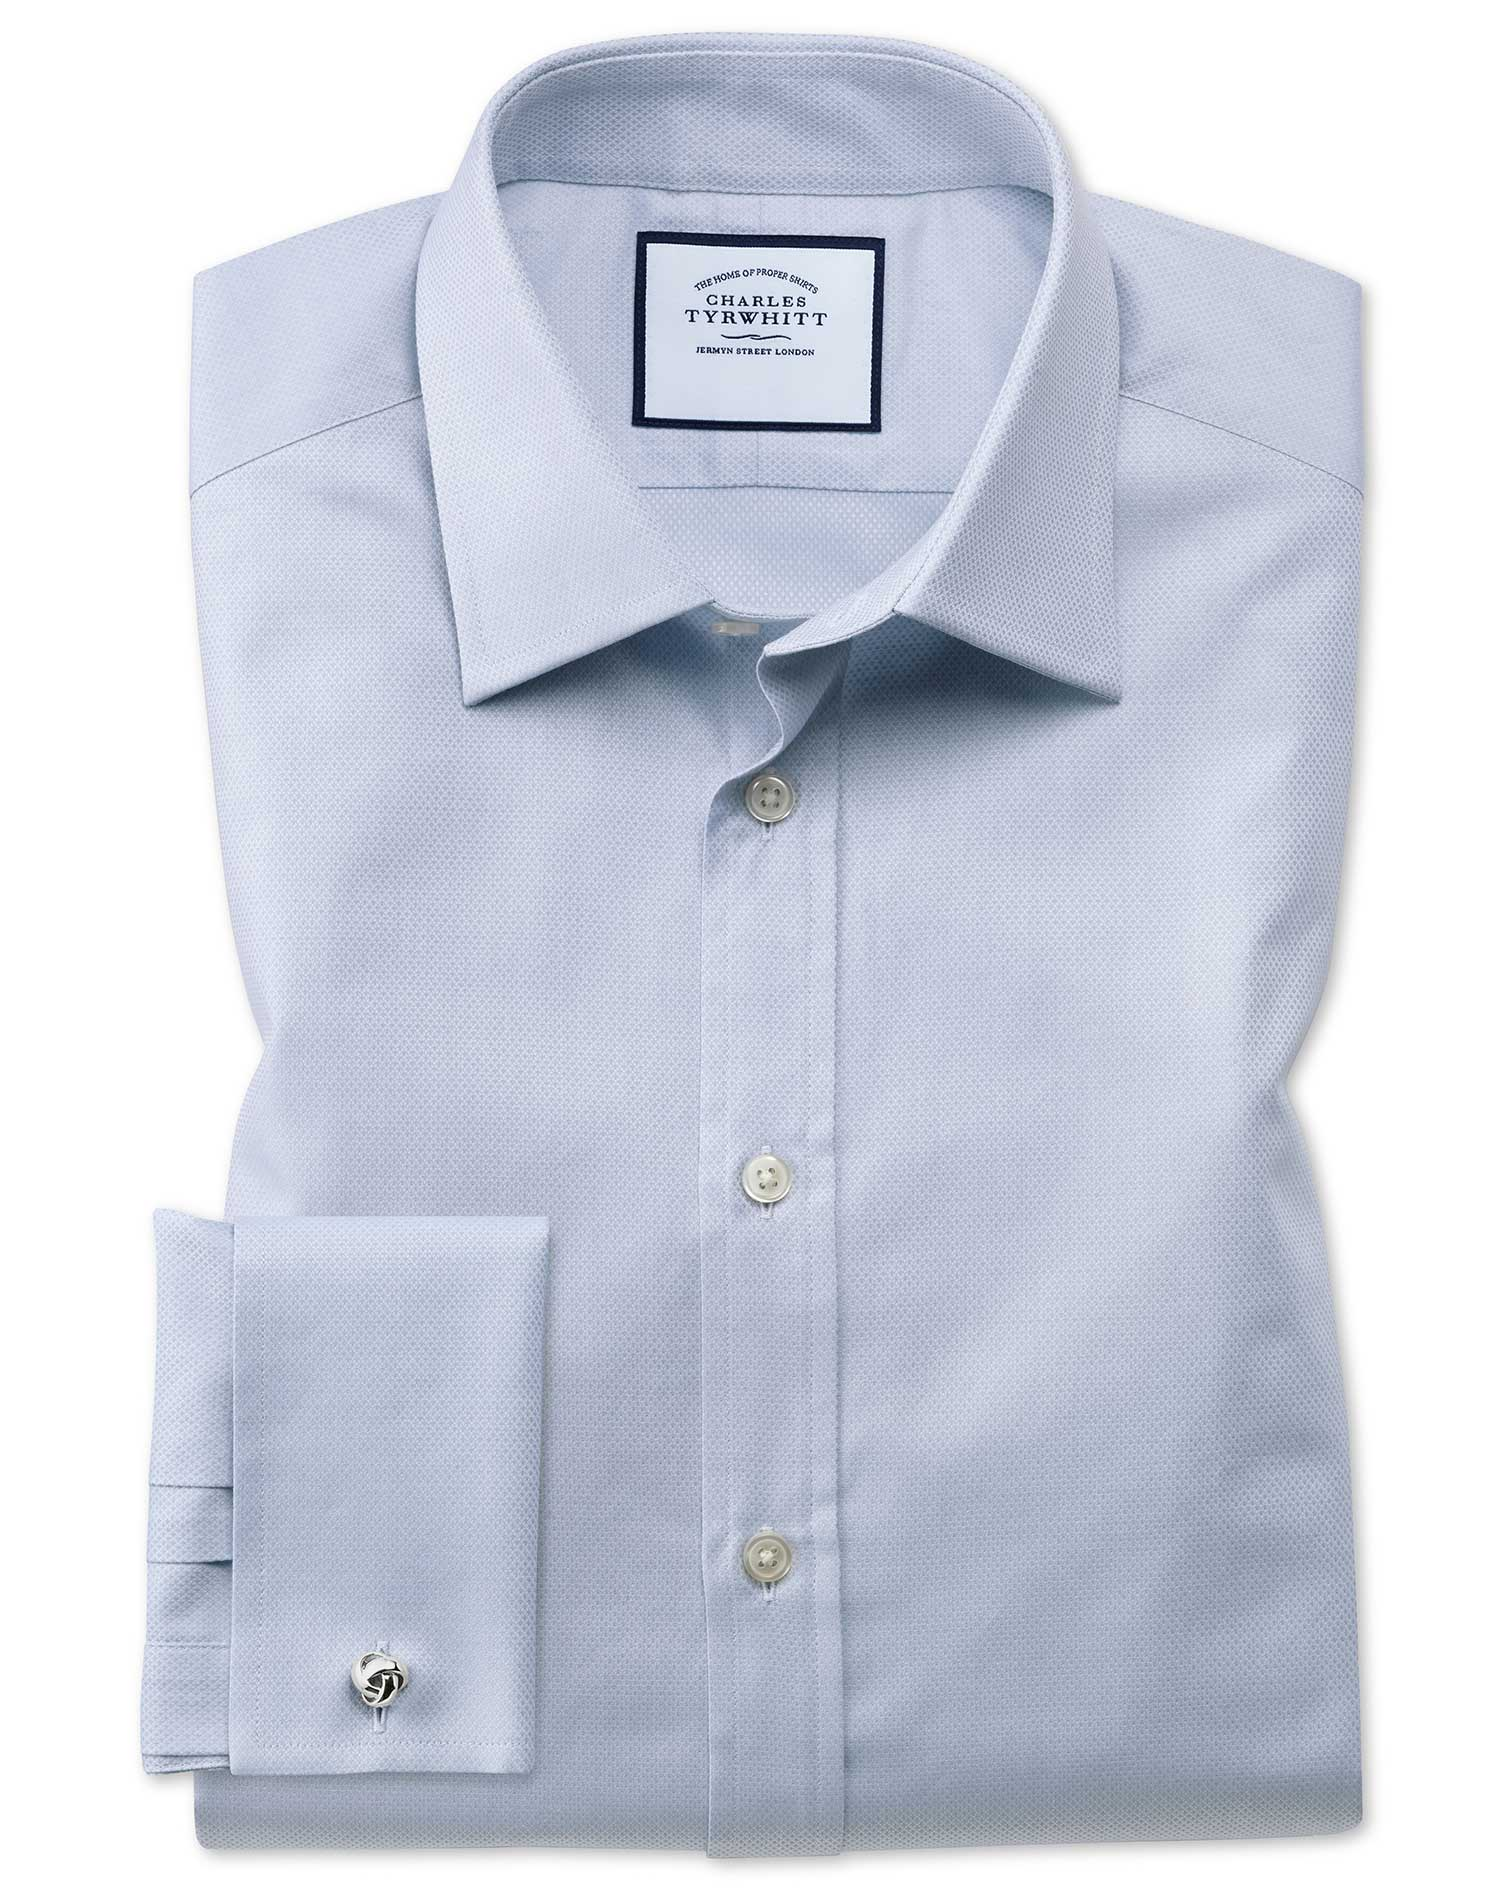 Slim Fit Egyptian Cotton Trellis Weave Grey Formal Shirt Single Cuff Size 16/34 by Charles Tyrwhitt